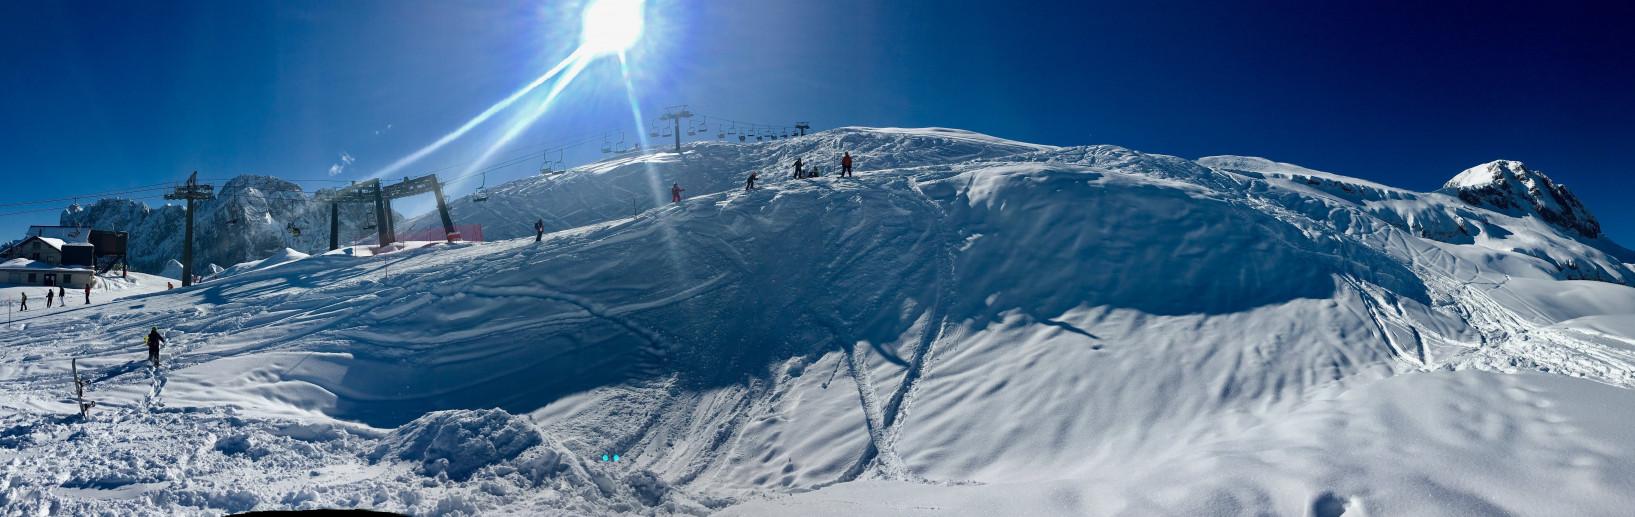 Colere, Val di Scalve (BG)